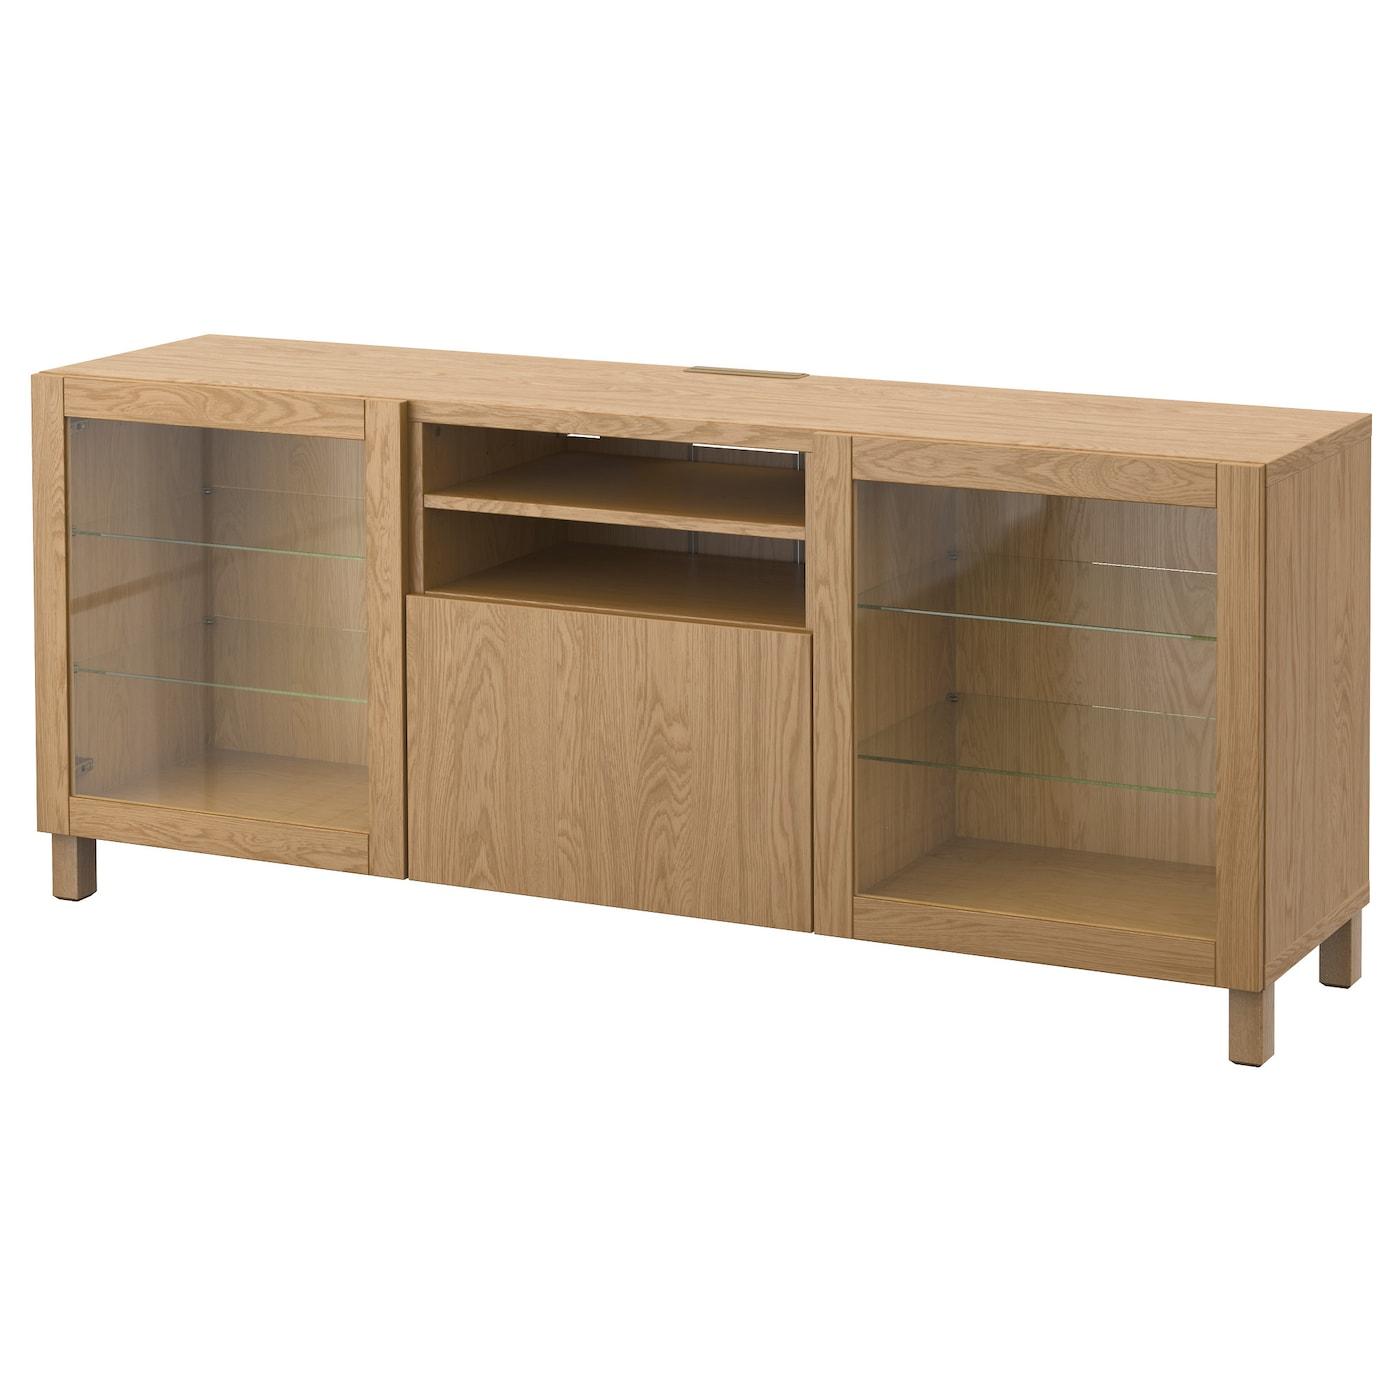 Best Tv Bench With Drawers Lappviken Sindvik Oak Effect Clear Glass 180x40x74 Cm Ikea